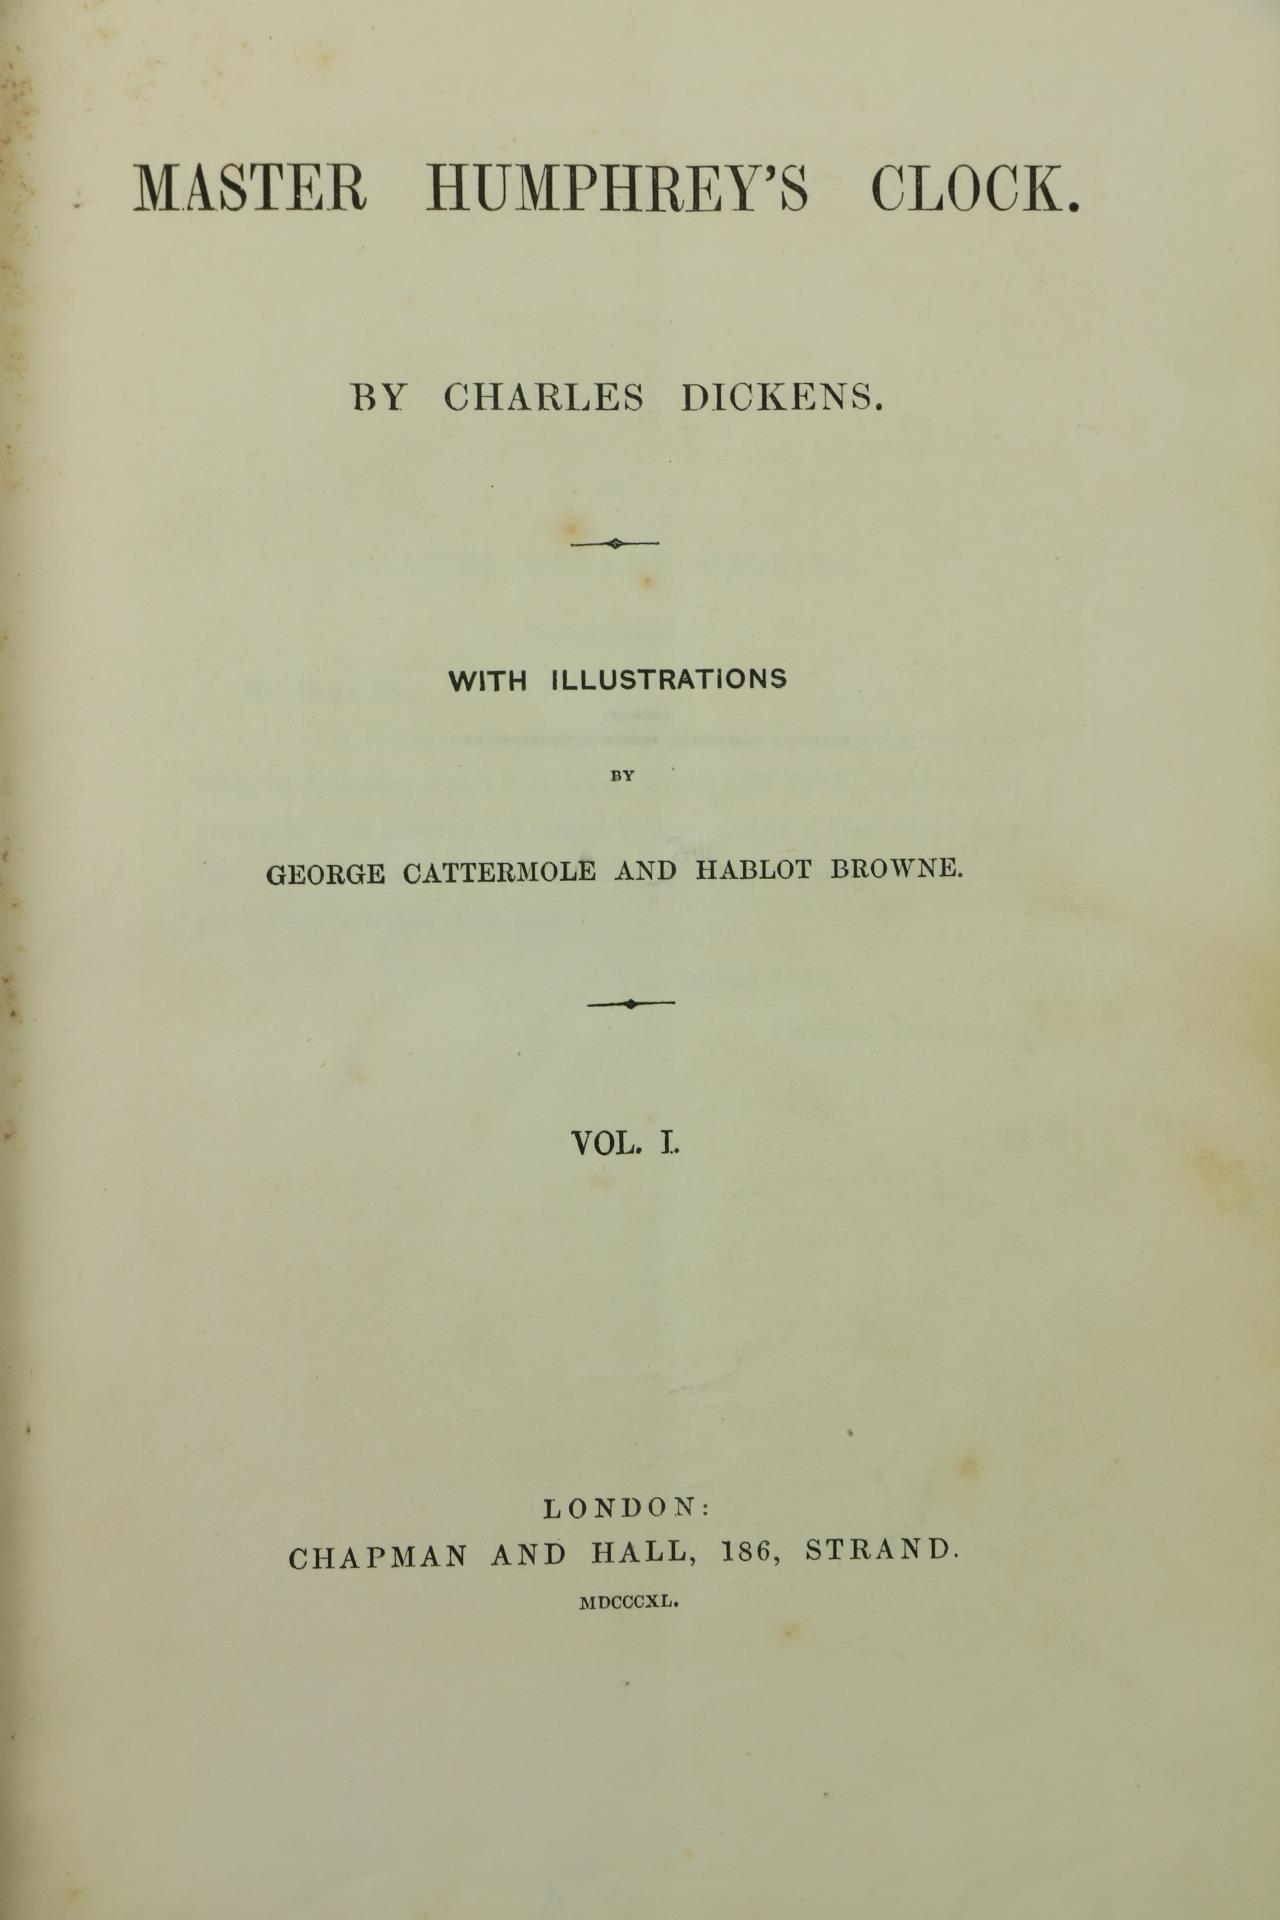 Dickens (Charles)ÿMaster Humphrey's clock, 3 vols. folio L. (Chapman & Hall) 1840.ÿFirst Edn., - Image 3 of 3